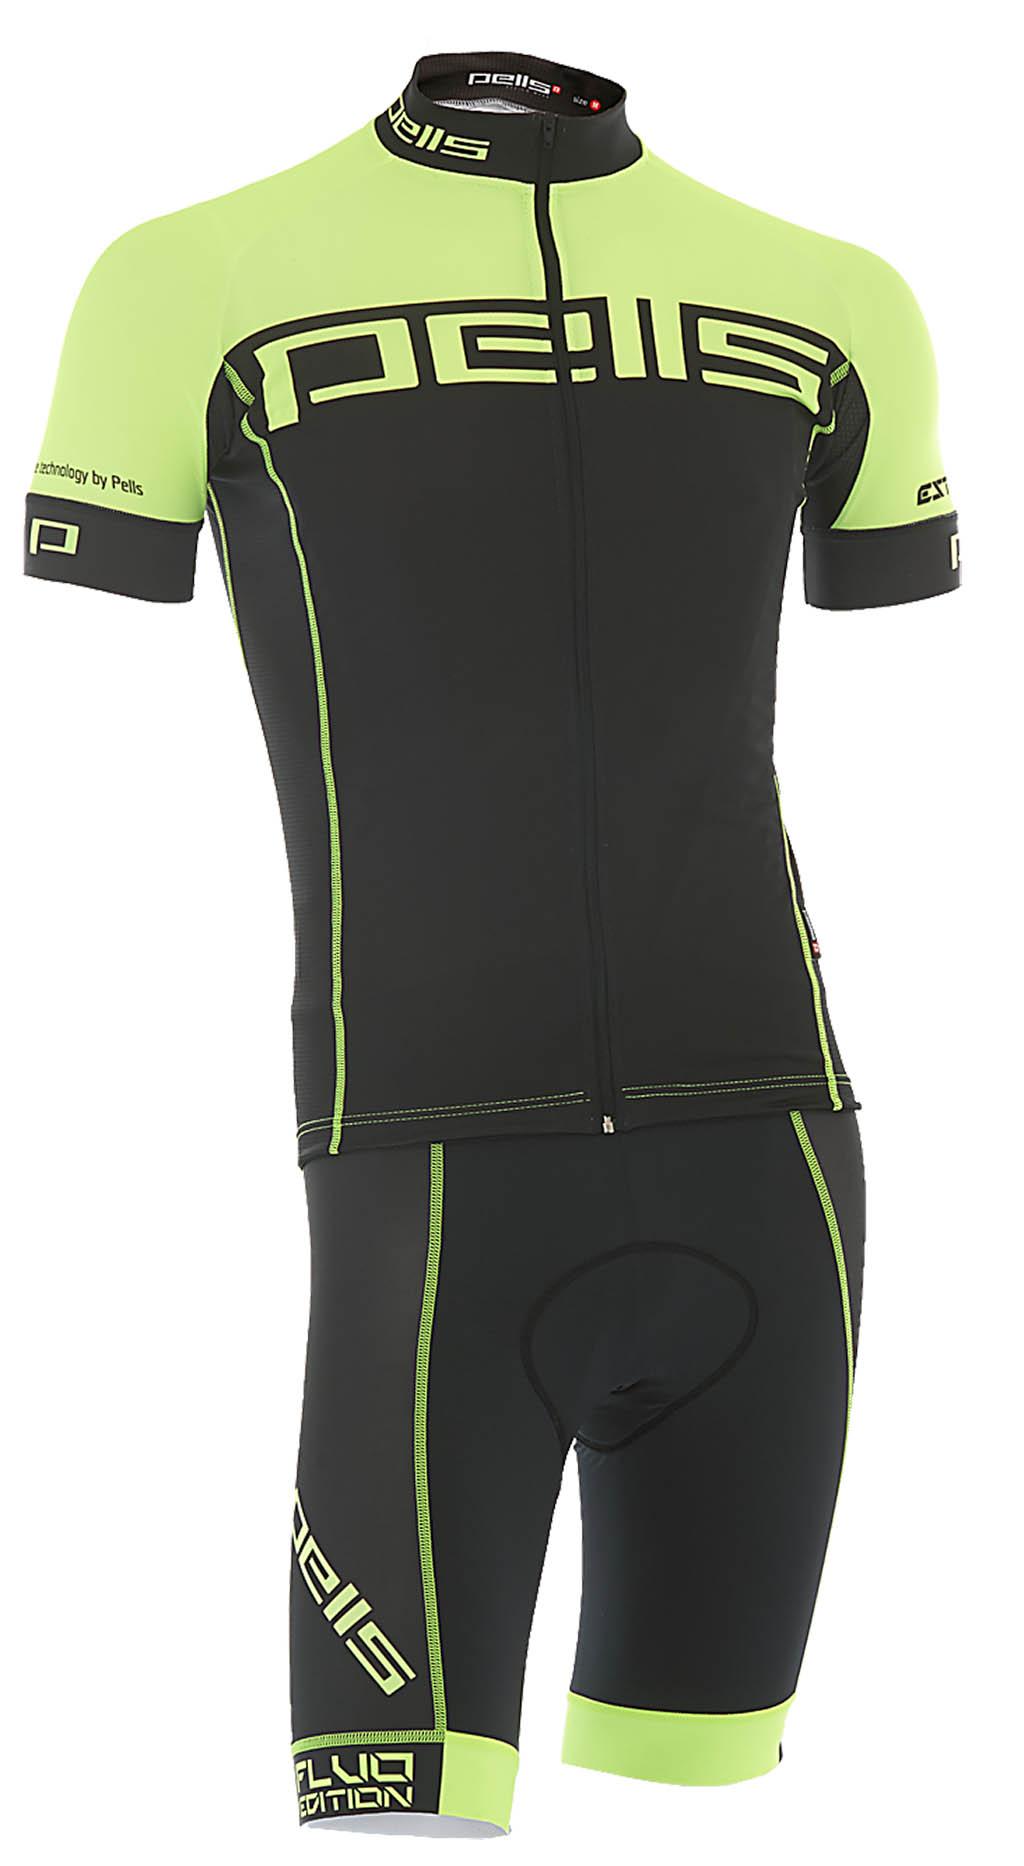 Pánský dres PELL'S FLUO, vel. XL, žlutá, krátký rukáv - ZDARMA DOPRAVNÉ! (Pánský cyklistický dres PELL'S, vel. XL, krátký rukáv, barva žlutá dle vyobrazení!)